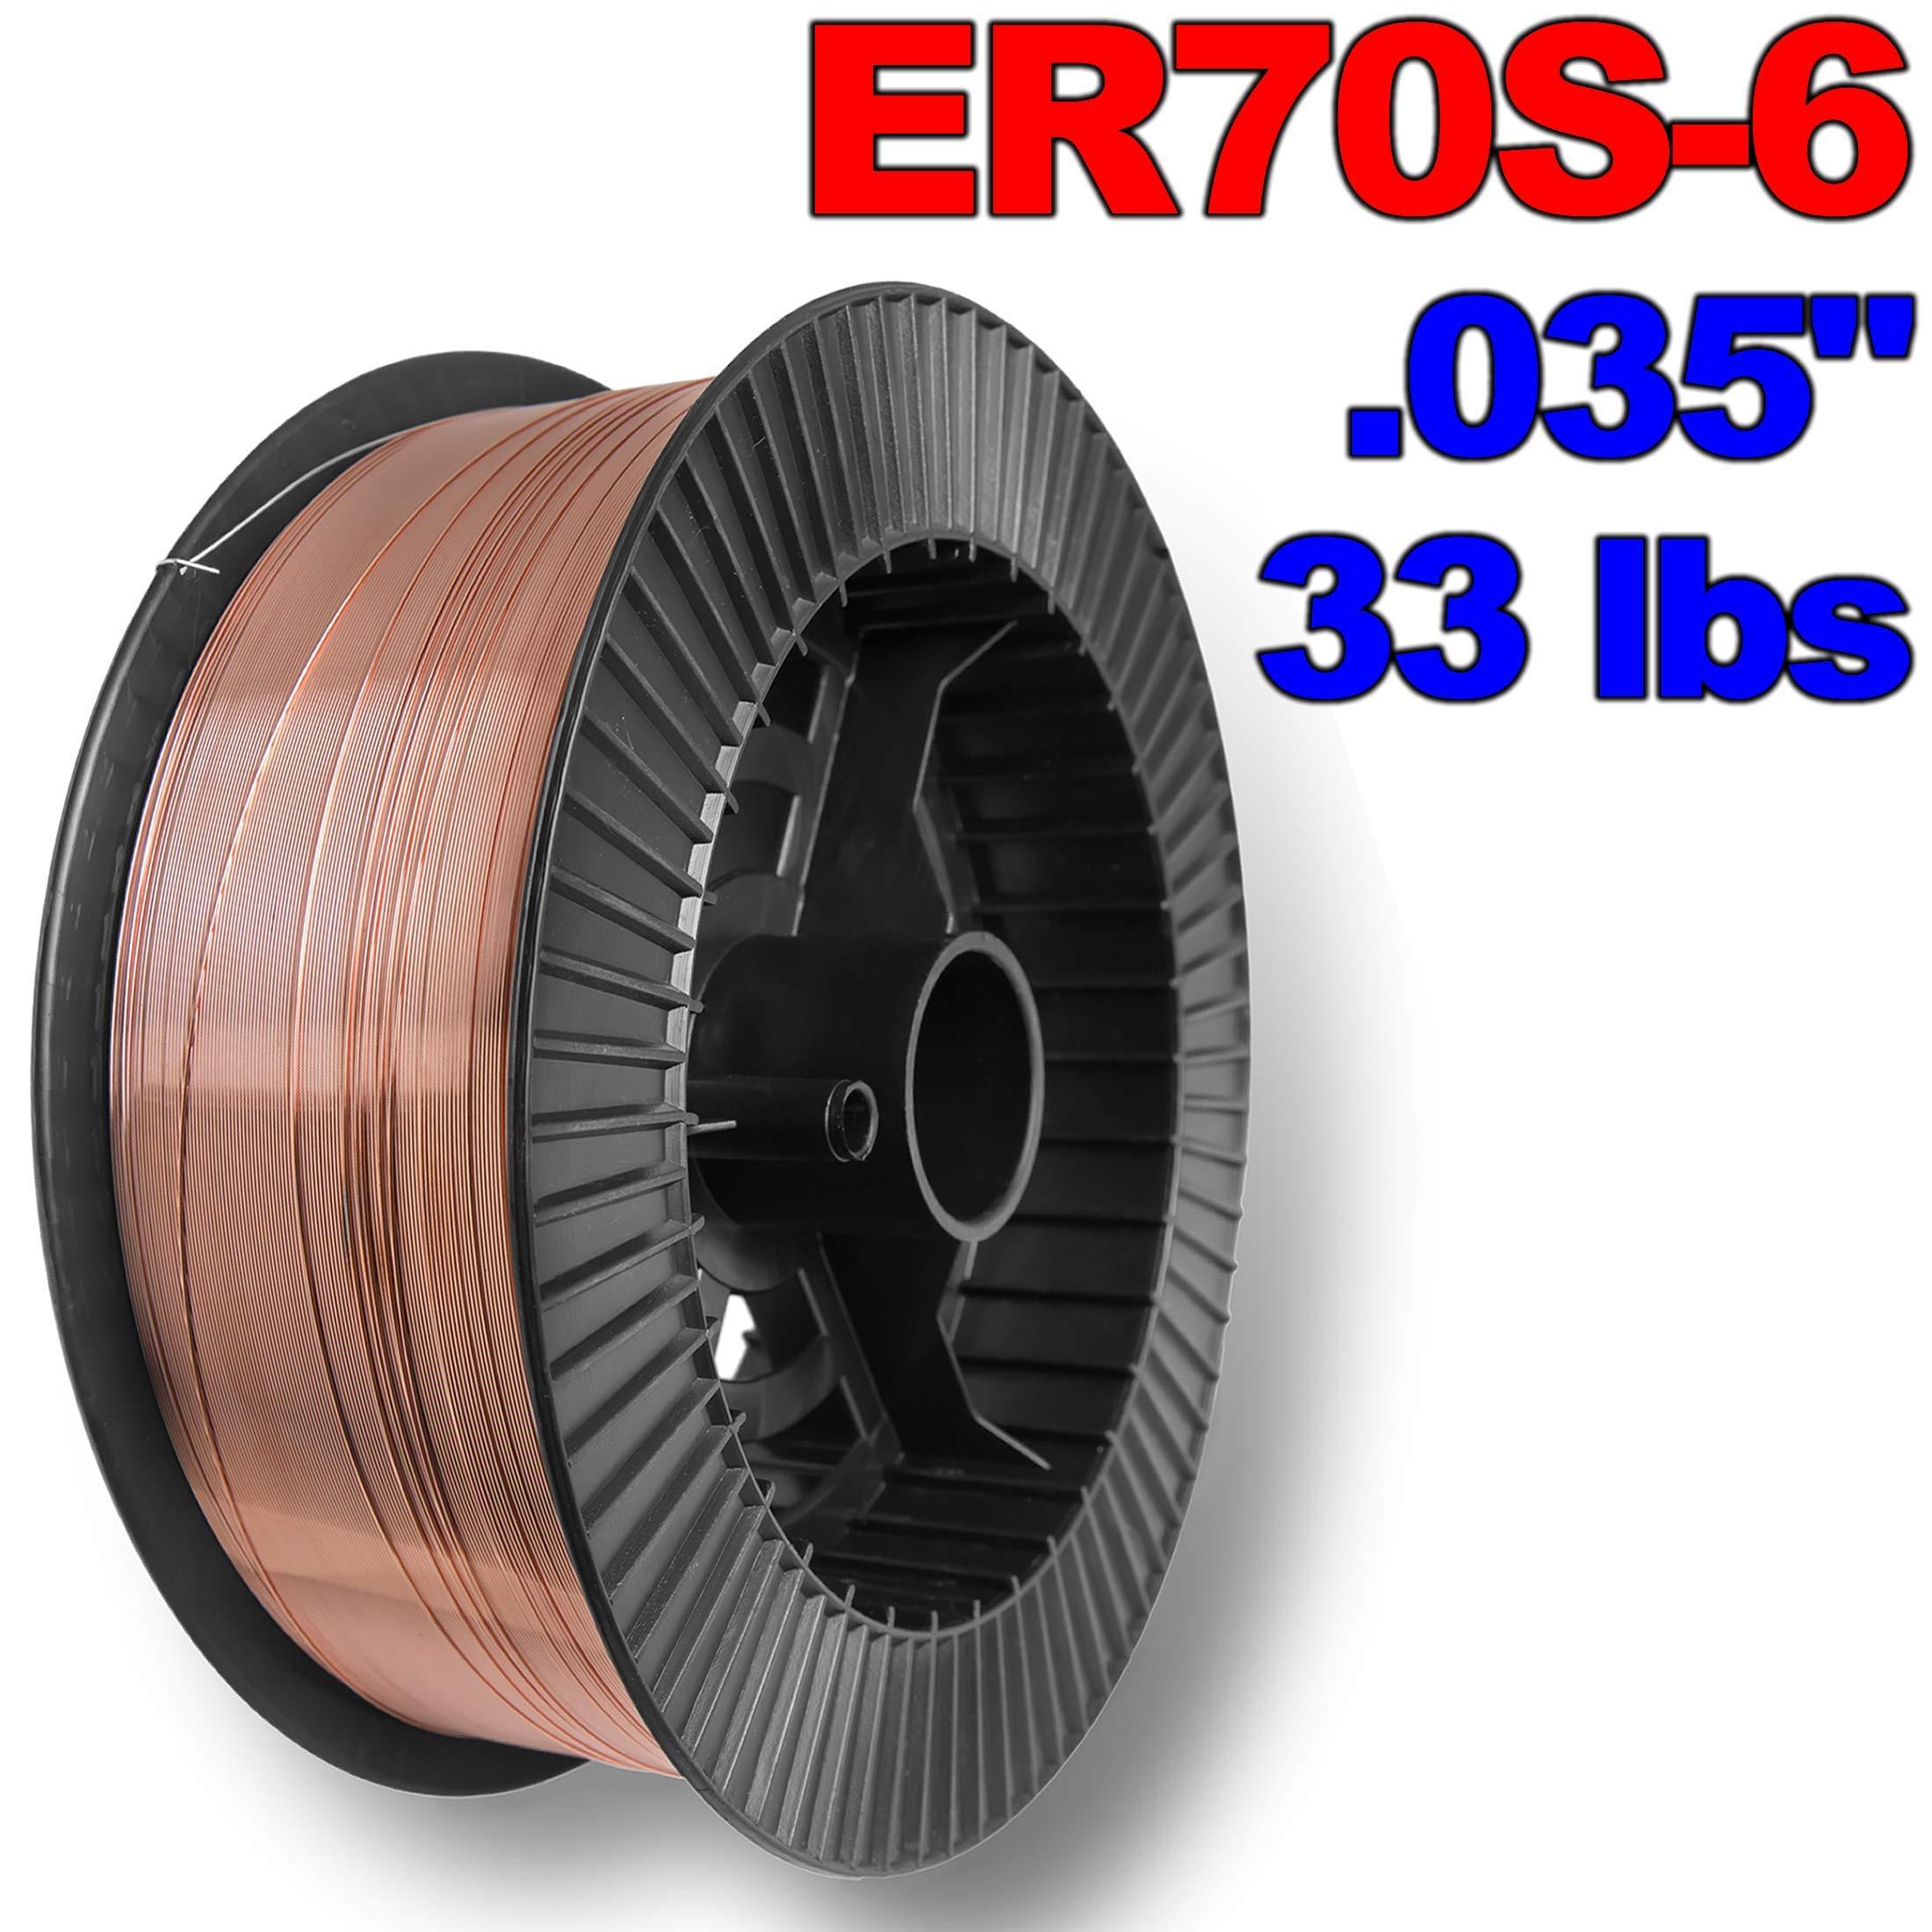 PGN - ER70S-6 .035'' (0.9 mm) Mild Steel MIG Welding Wire - 33 Lbs Spool by PGN Bearings